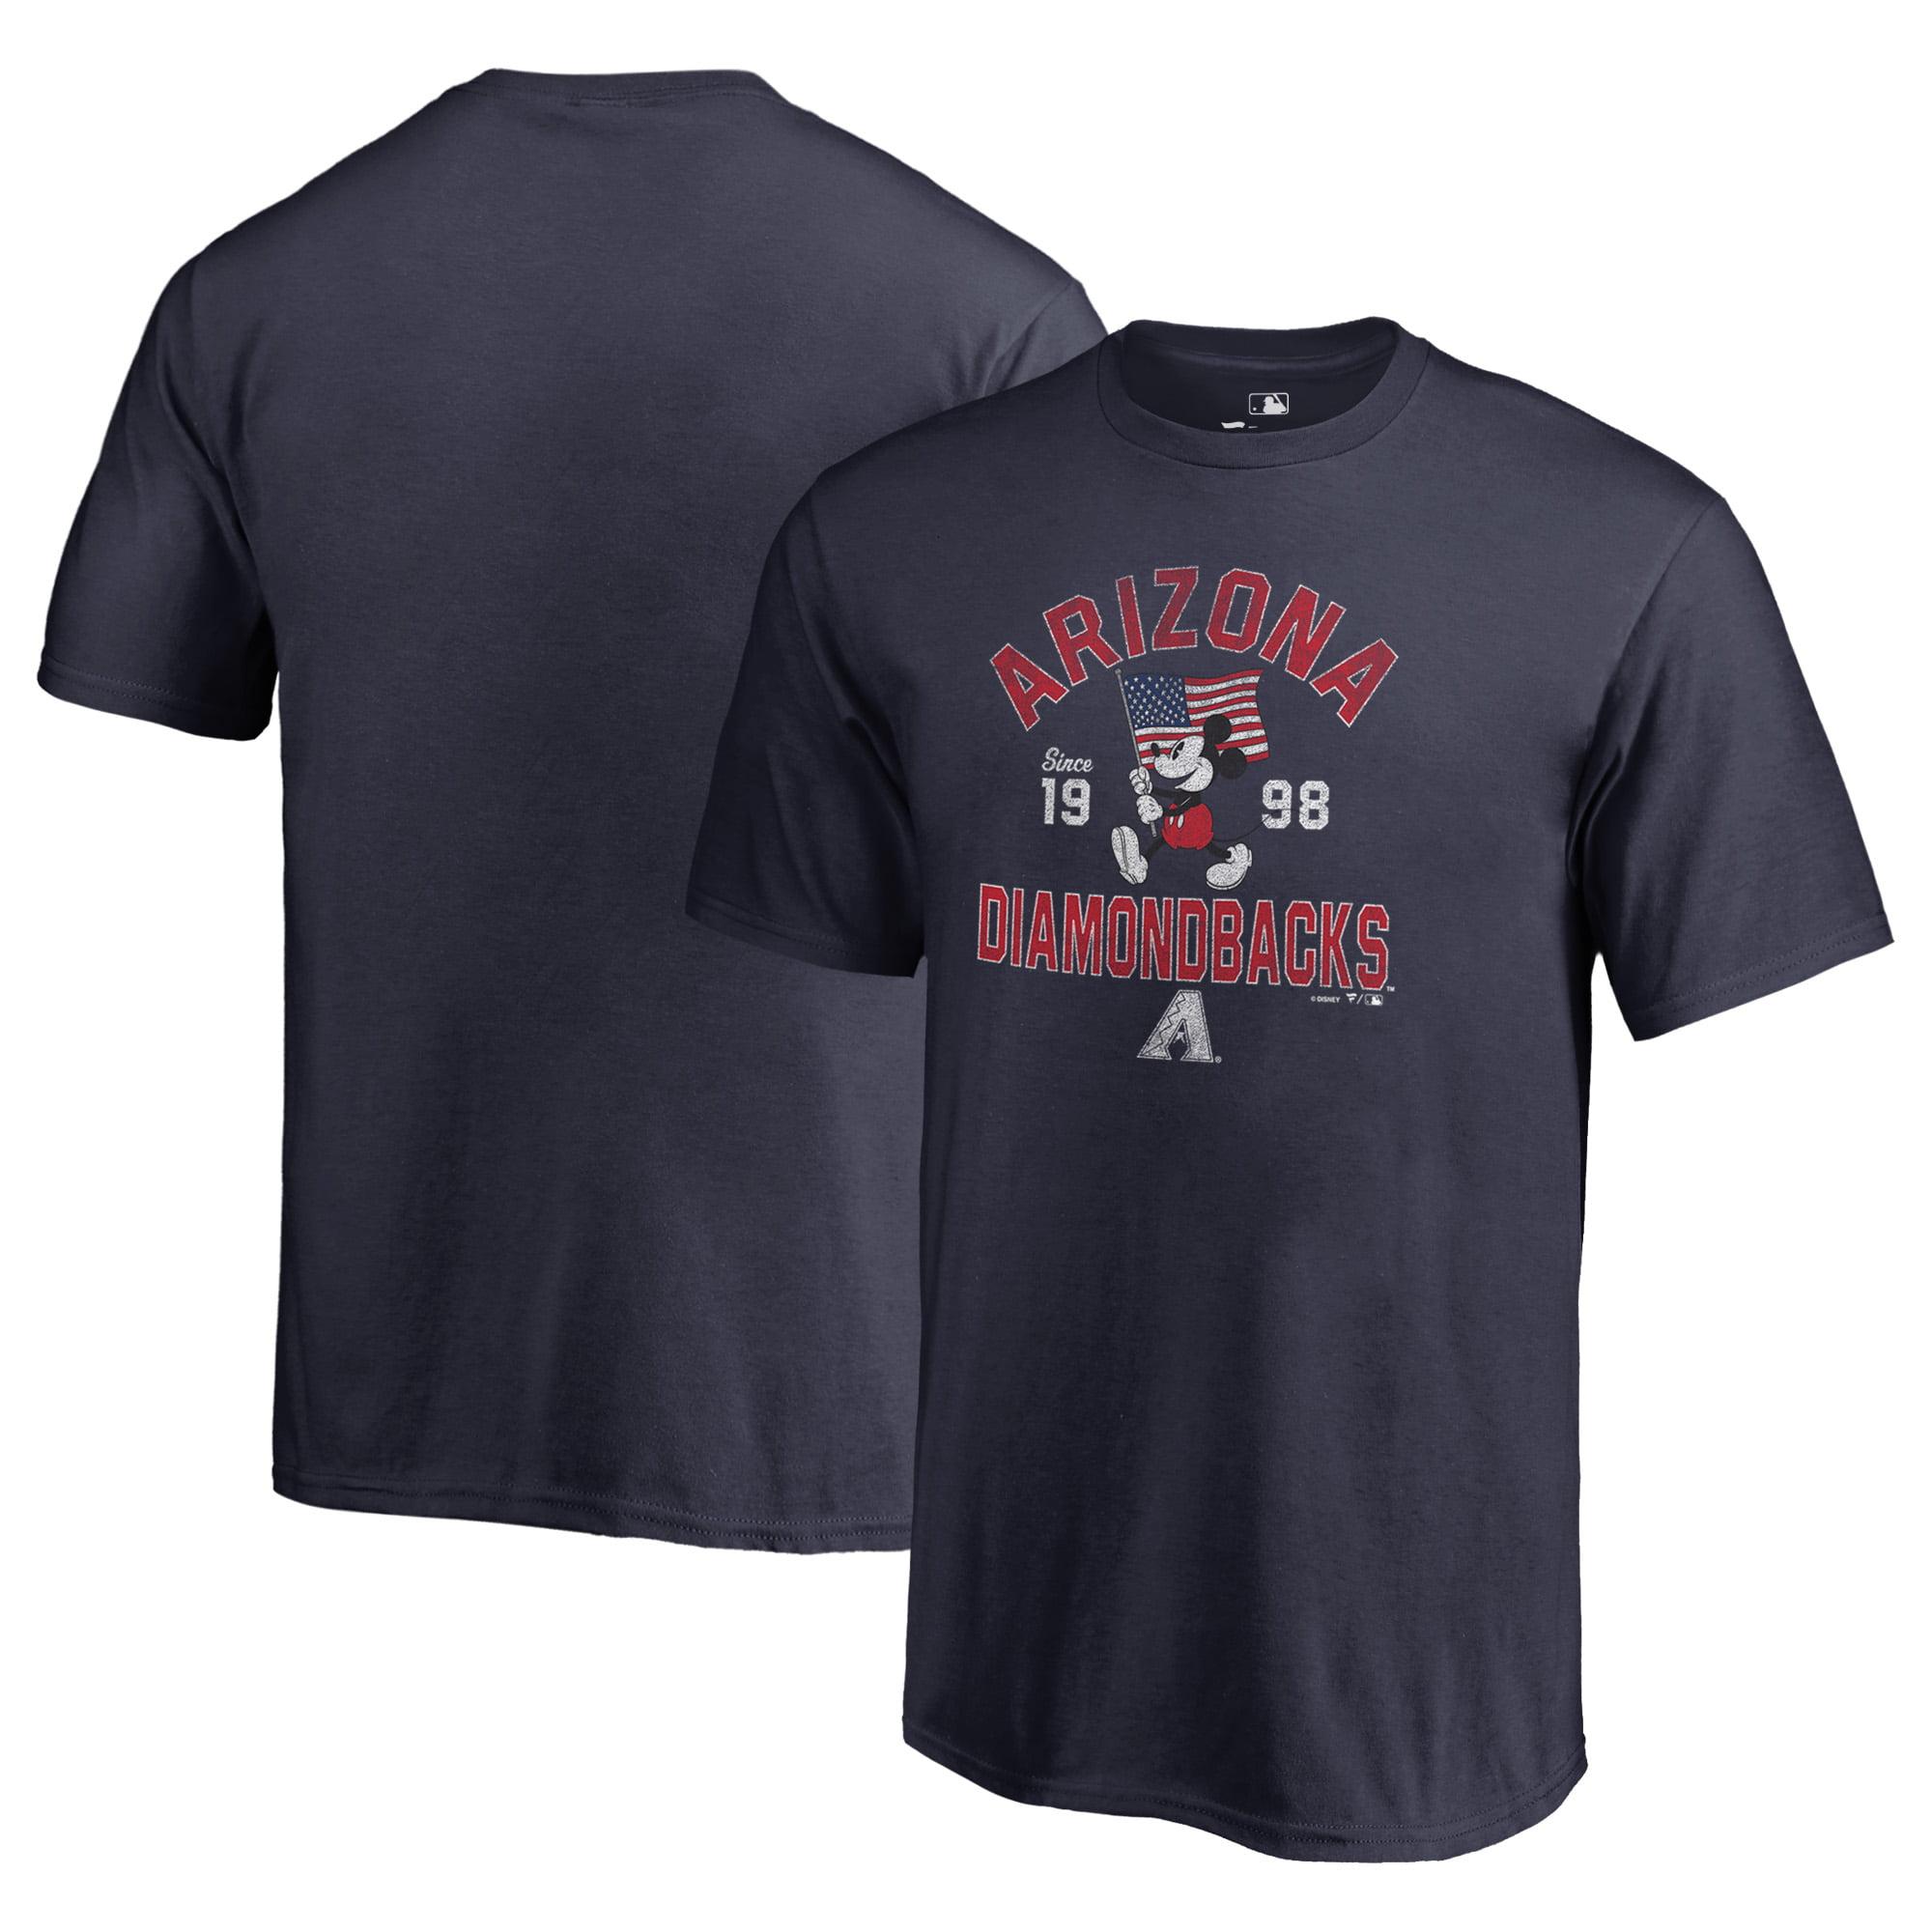 Arizona Diamondbacks Fanatics Branded Youth Disney American Icon T-Shirt - Navy